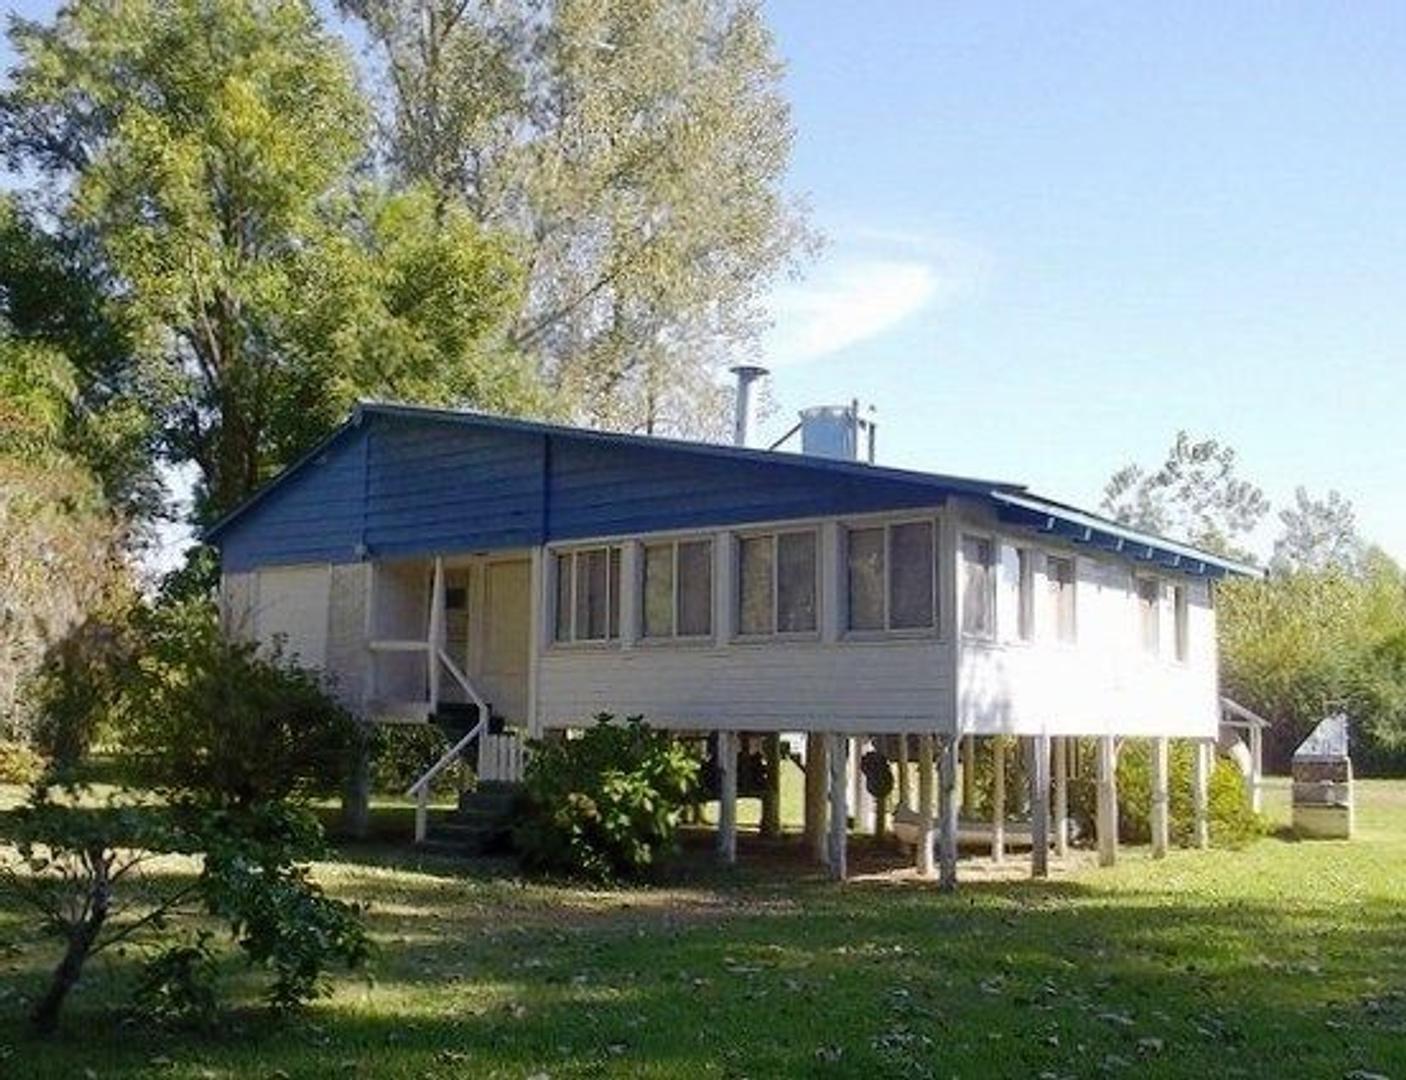 XINTEL(MBG-MBG-191) Casa - Venta - Argentina, San Fernando